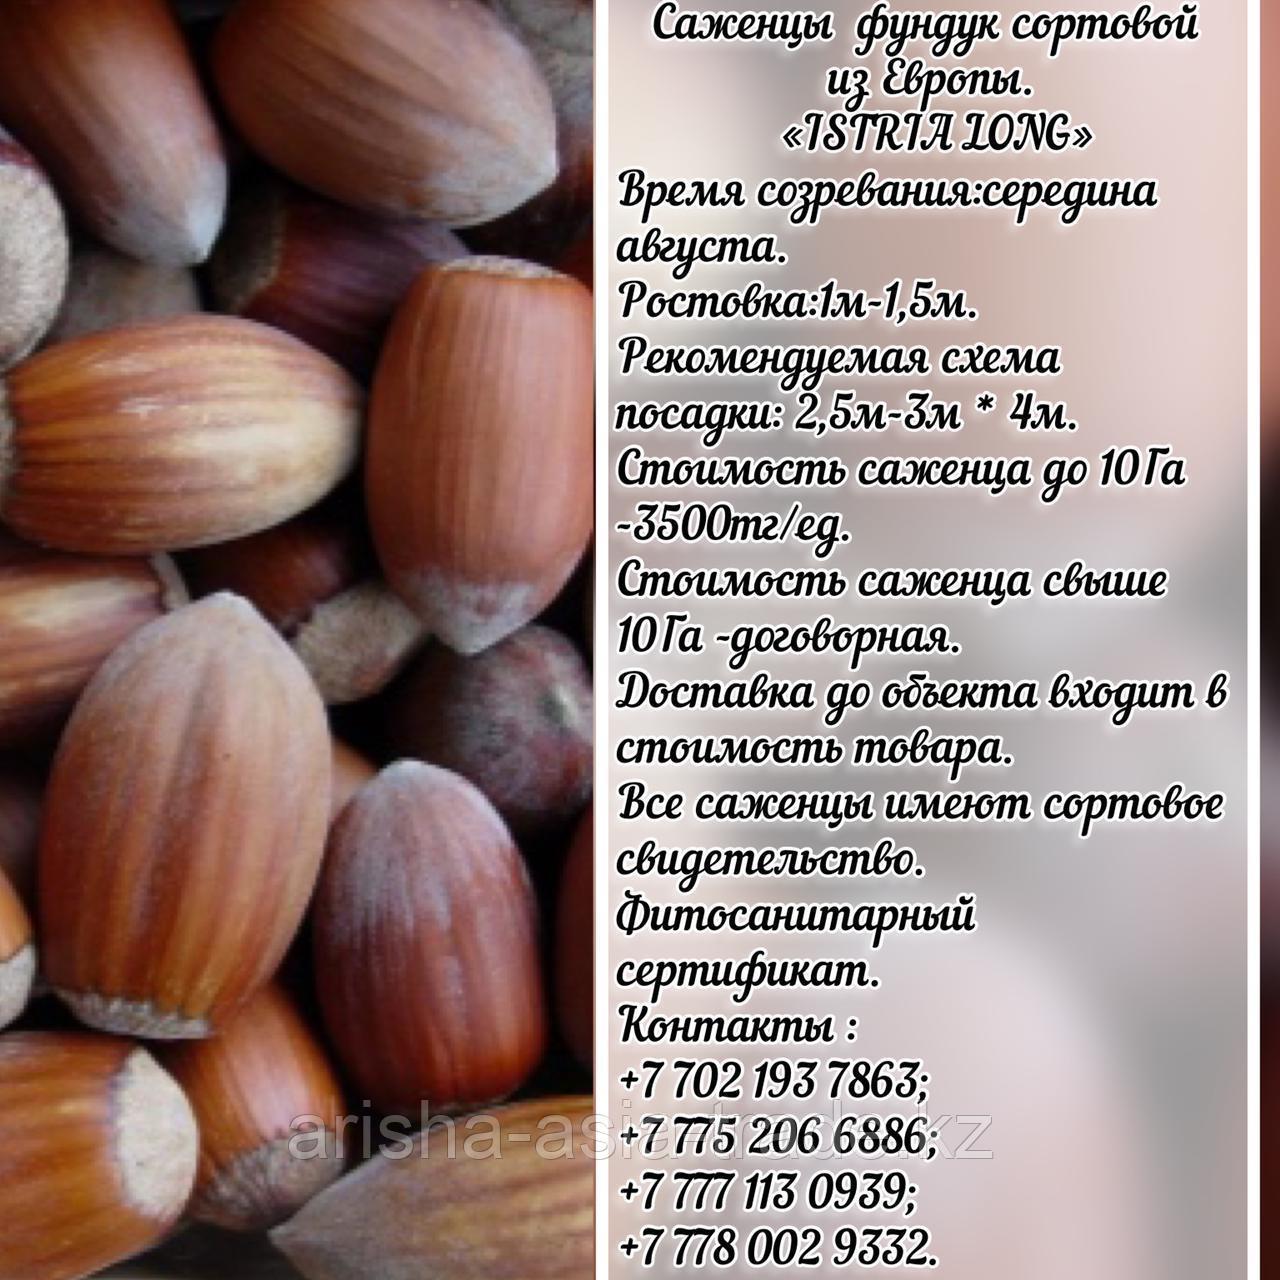 Саженец фундука Istria Long (Истриа Лонг) Сербия